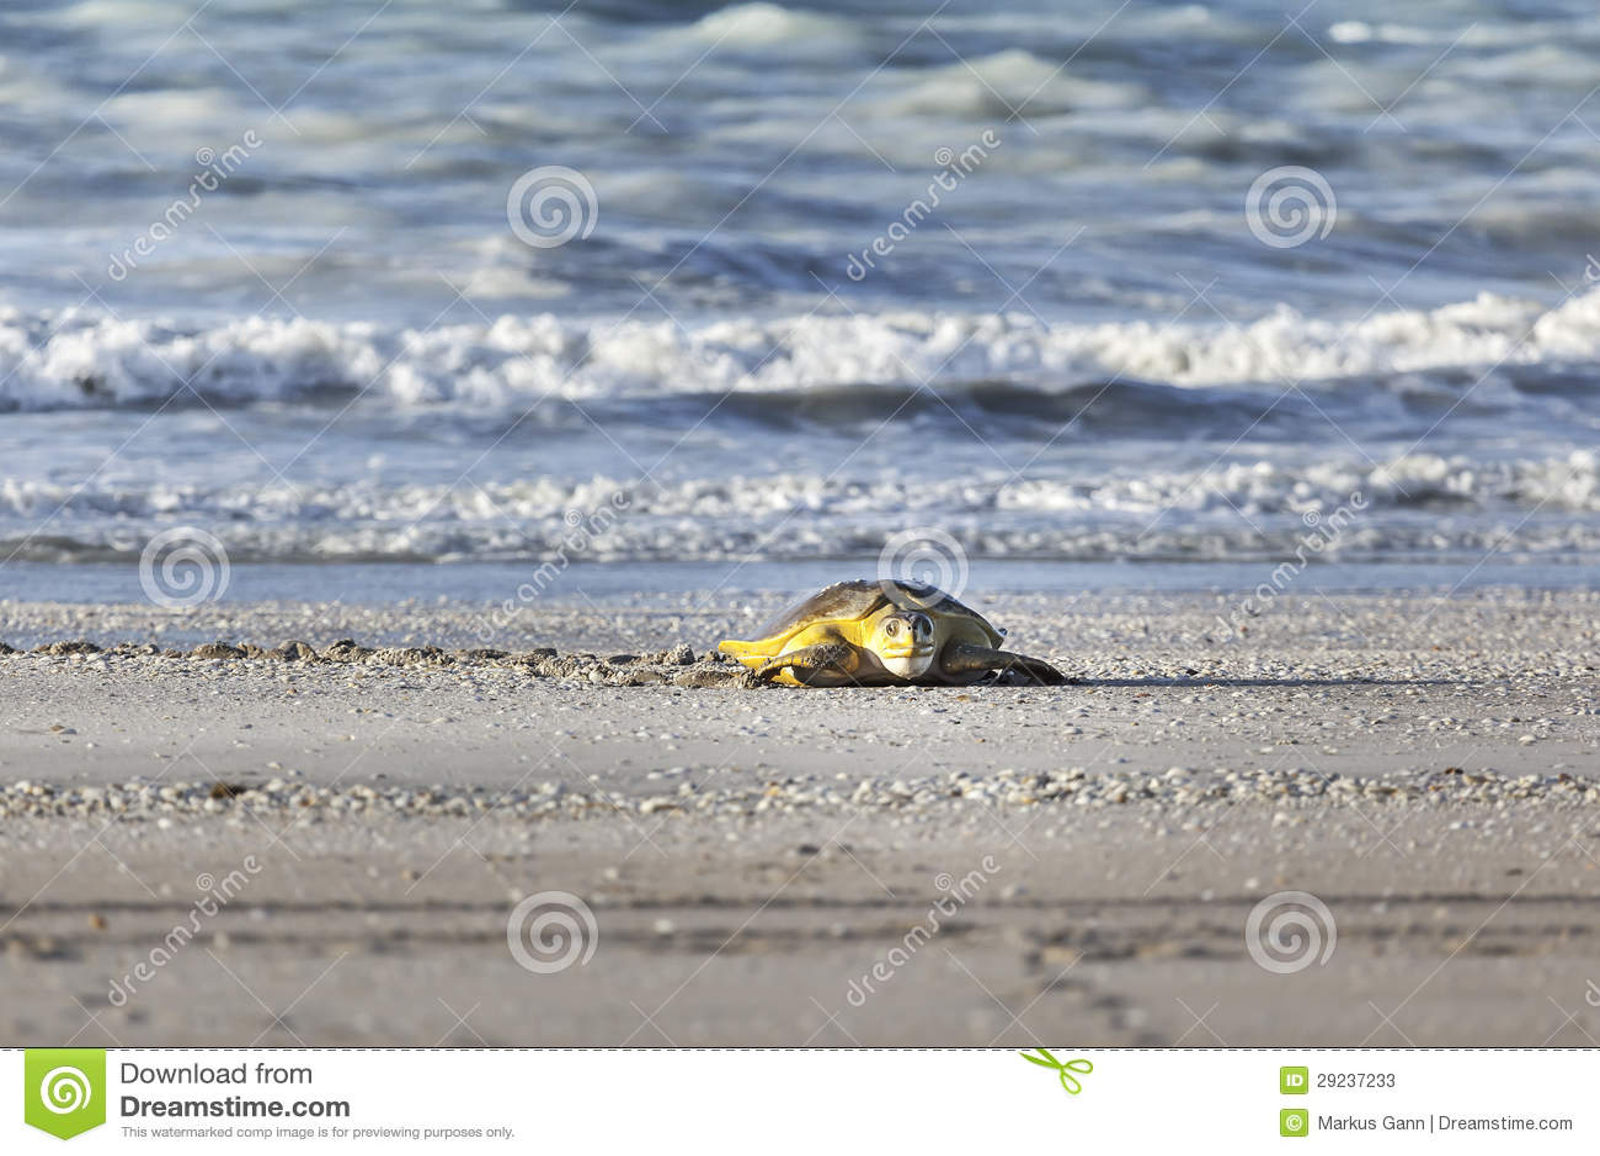 Download Tartaruga na praia imagem de stock. Imagem de olho, oceano - 29237233